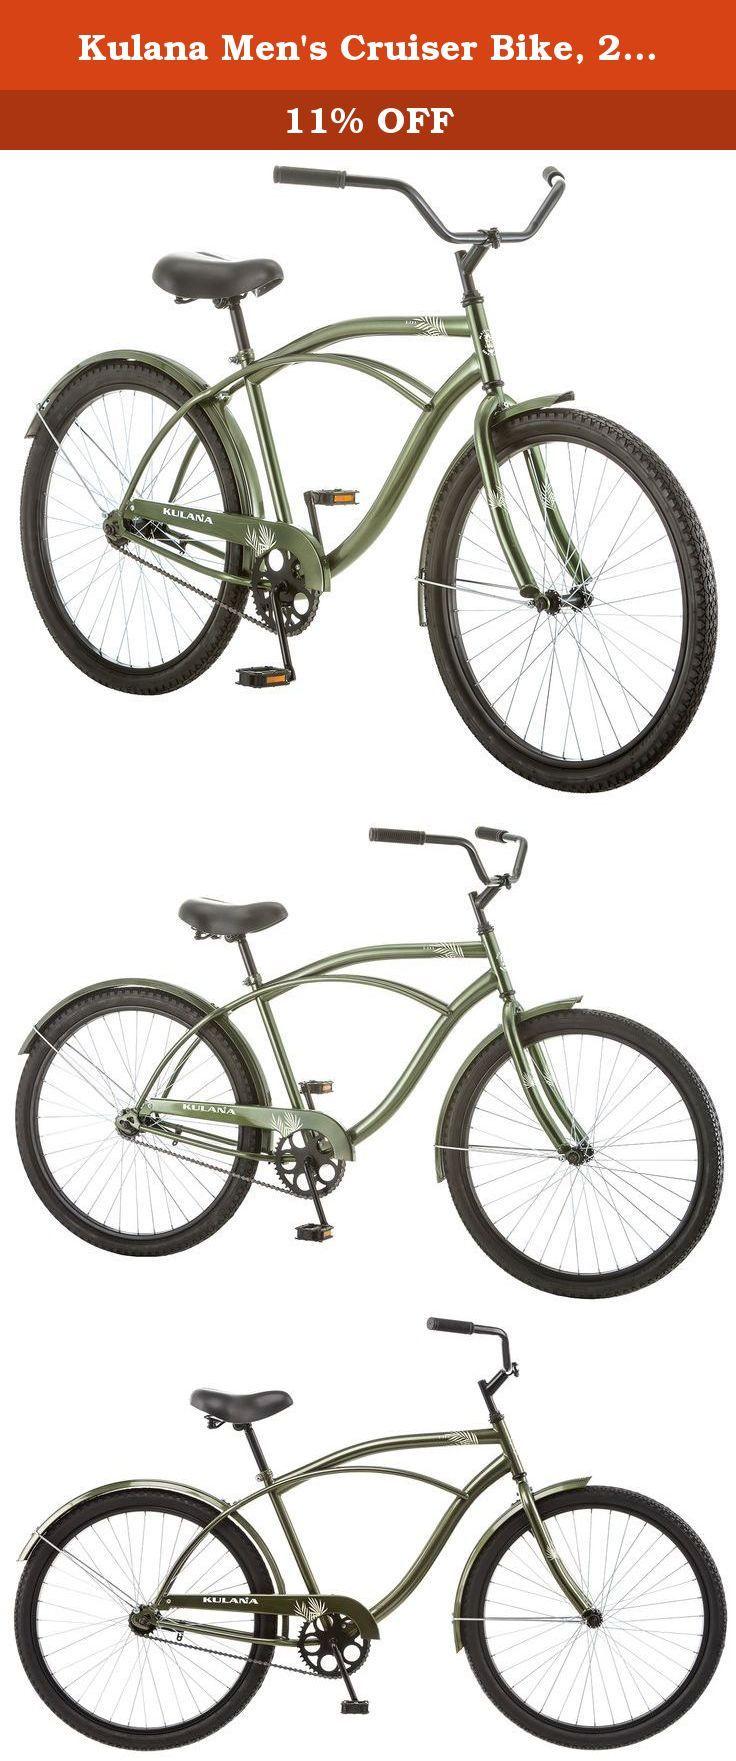 Kulana Men S Cruiser Bike 26 Inch Green The Best Value On The